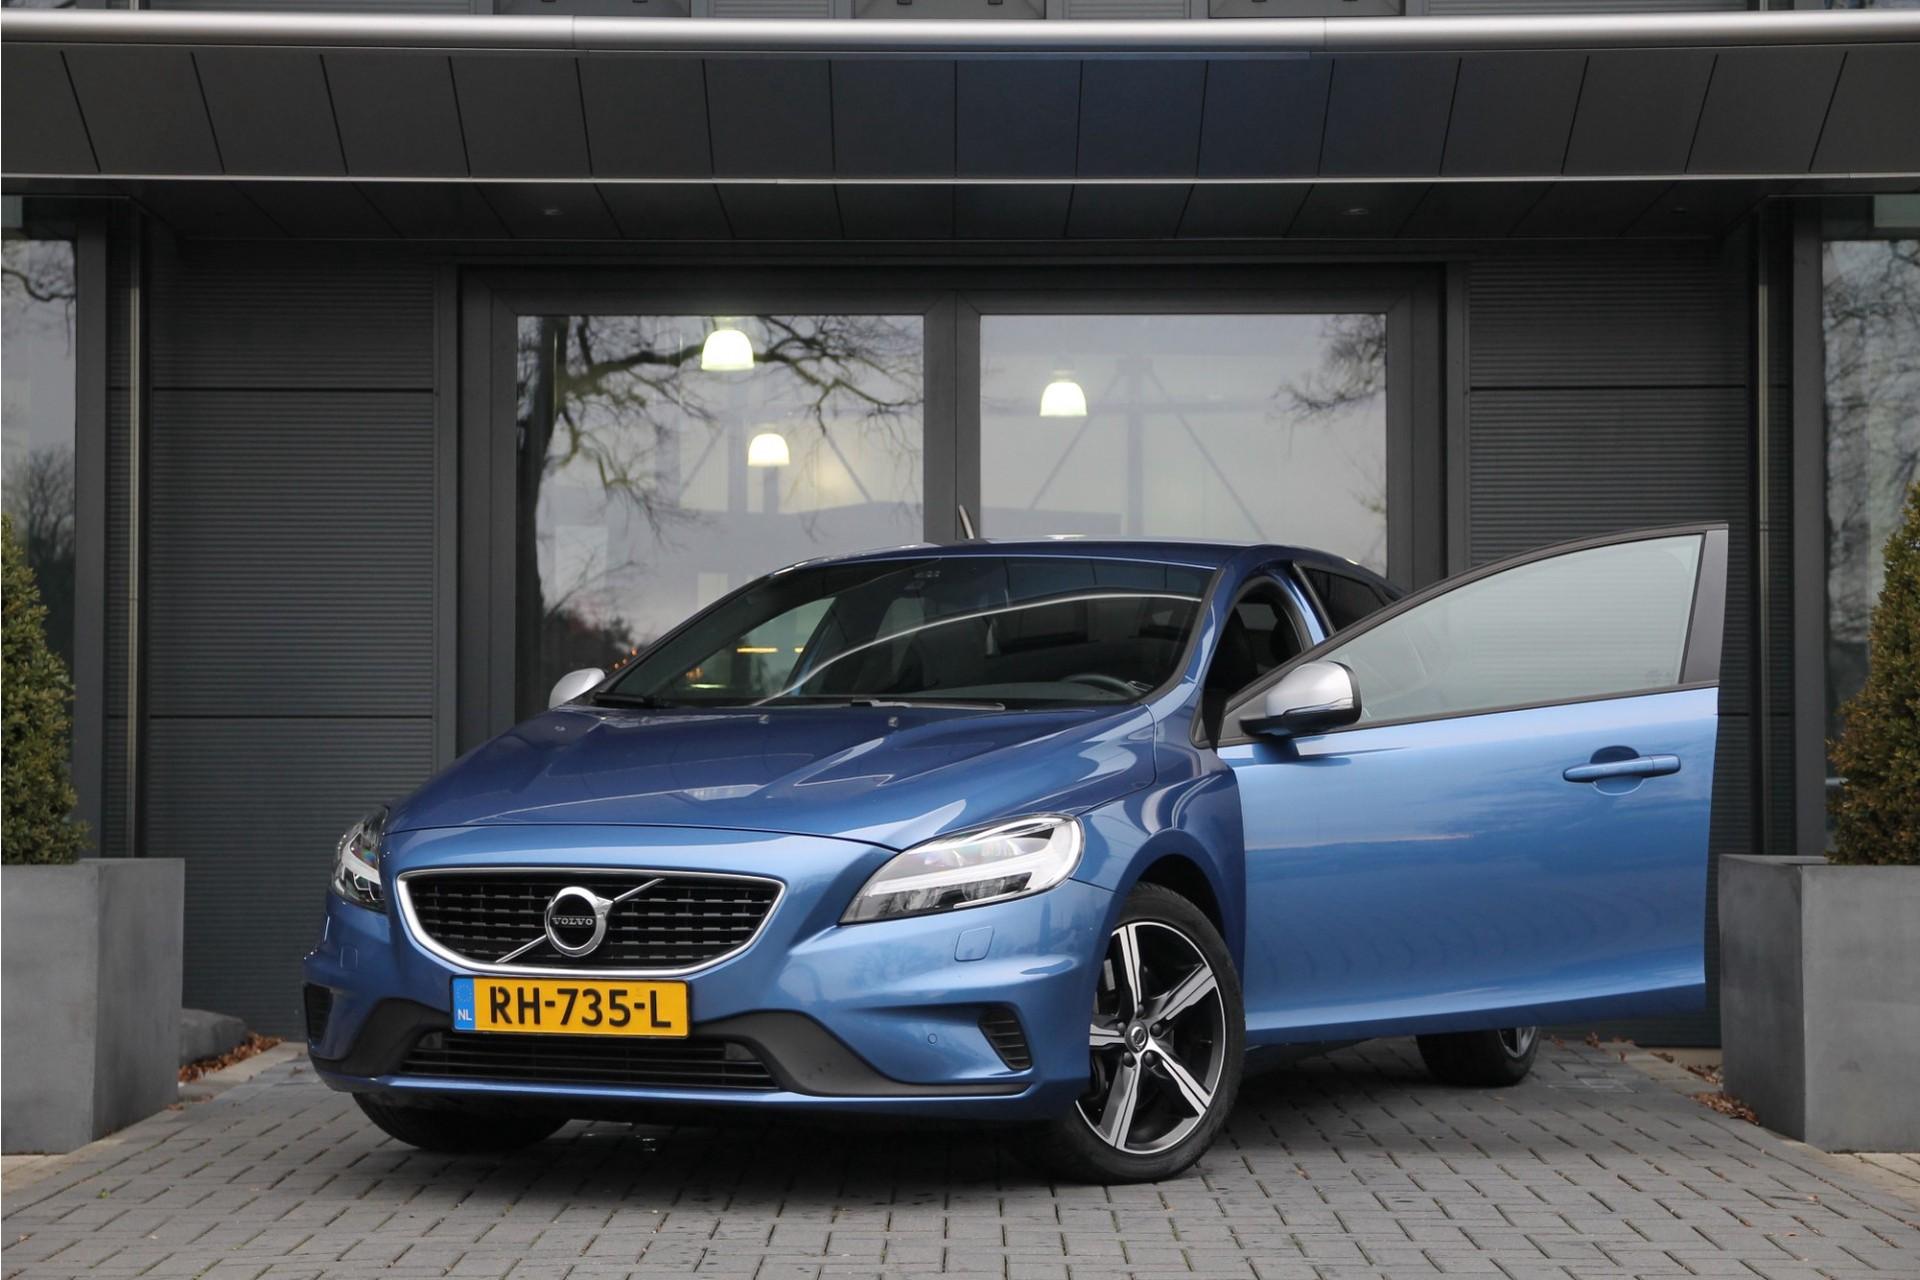 Tweedehands Volvo V40 2017 occasion